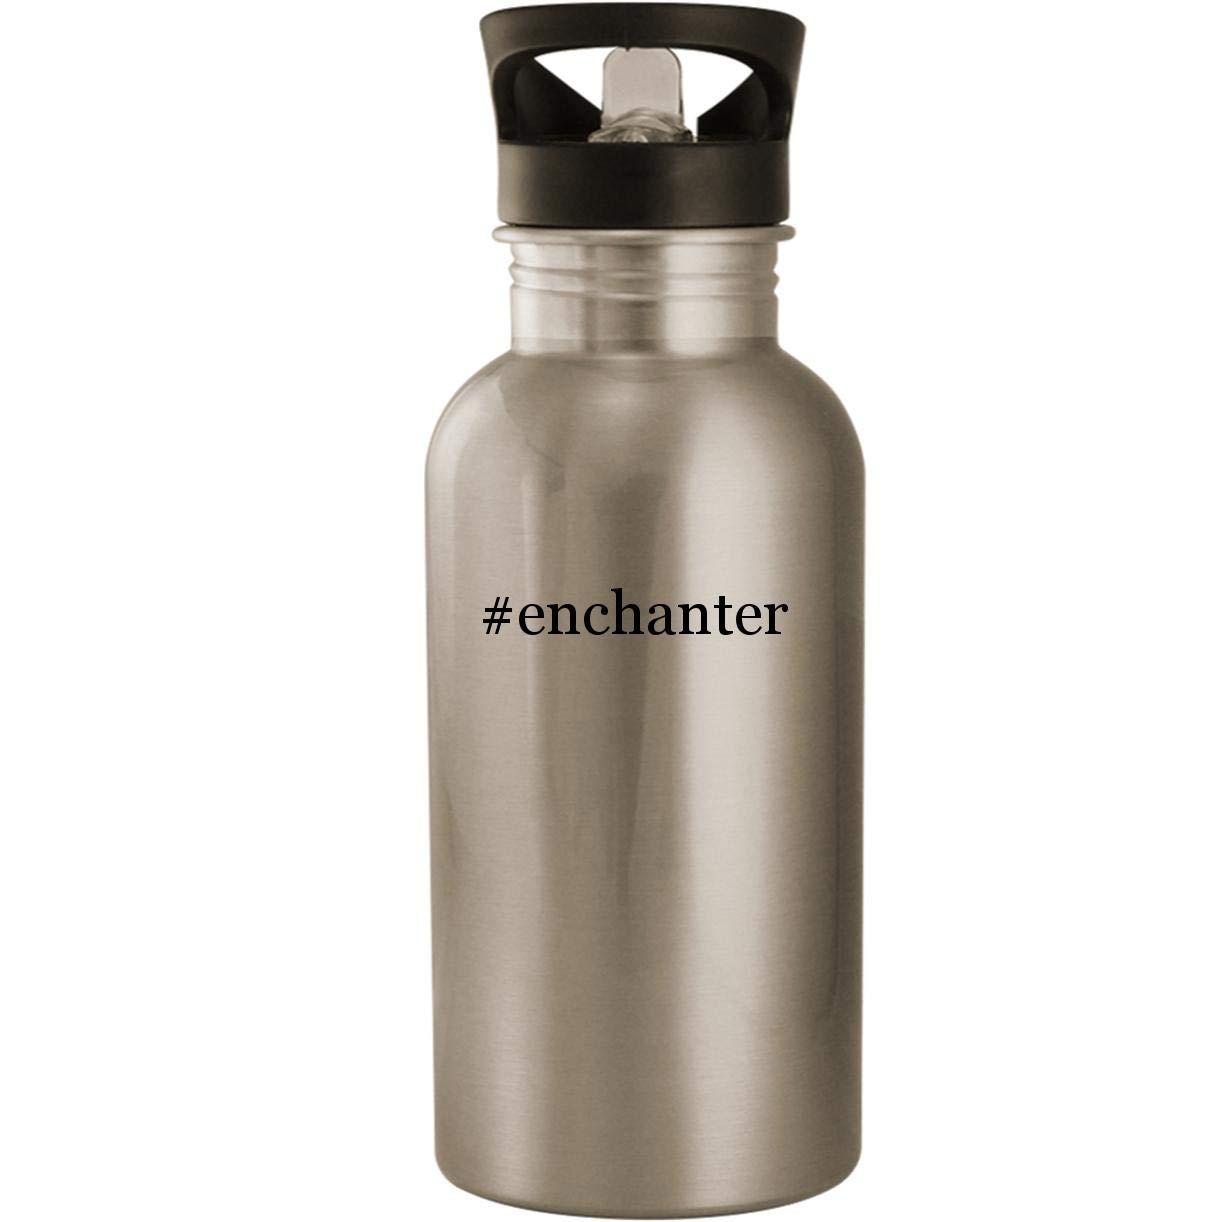 #enchanter – ステンレススチール 20オンス ロードレディウォーターボトル シルバー US-C-07-18-02-018895-04-26-18-26 B07GNF75WZ シルバー